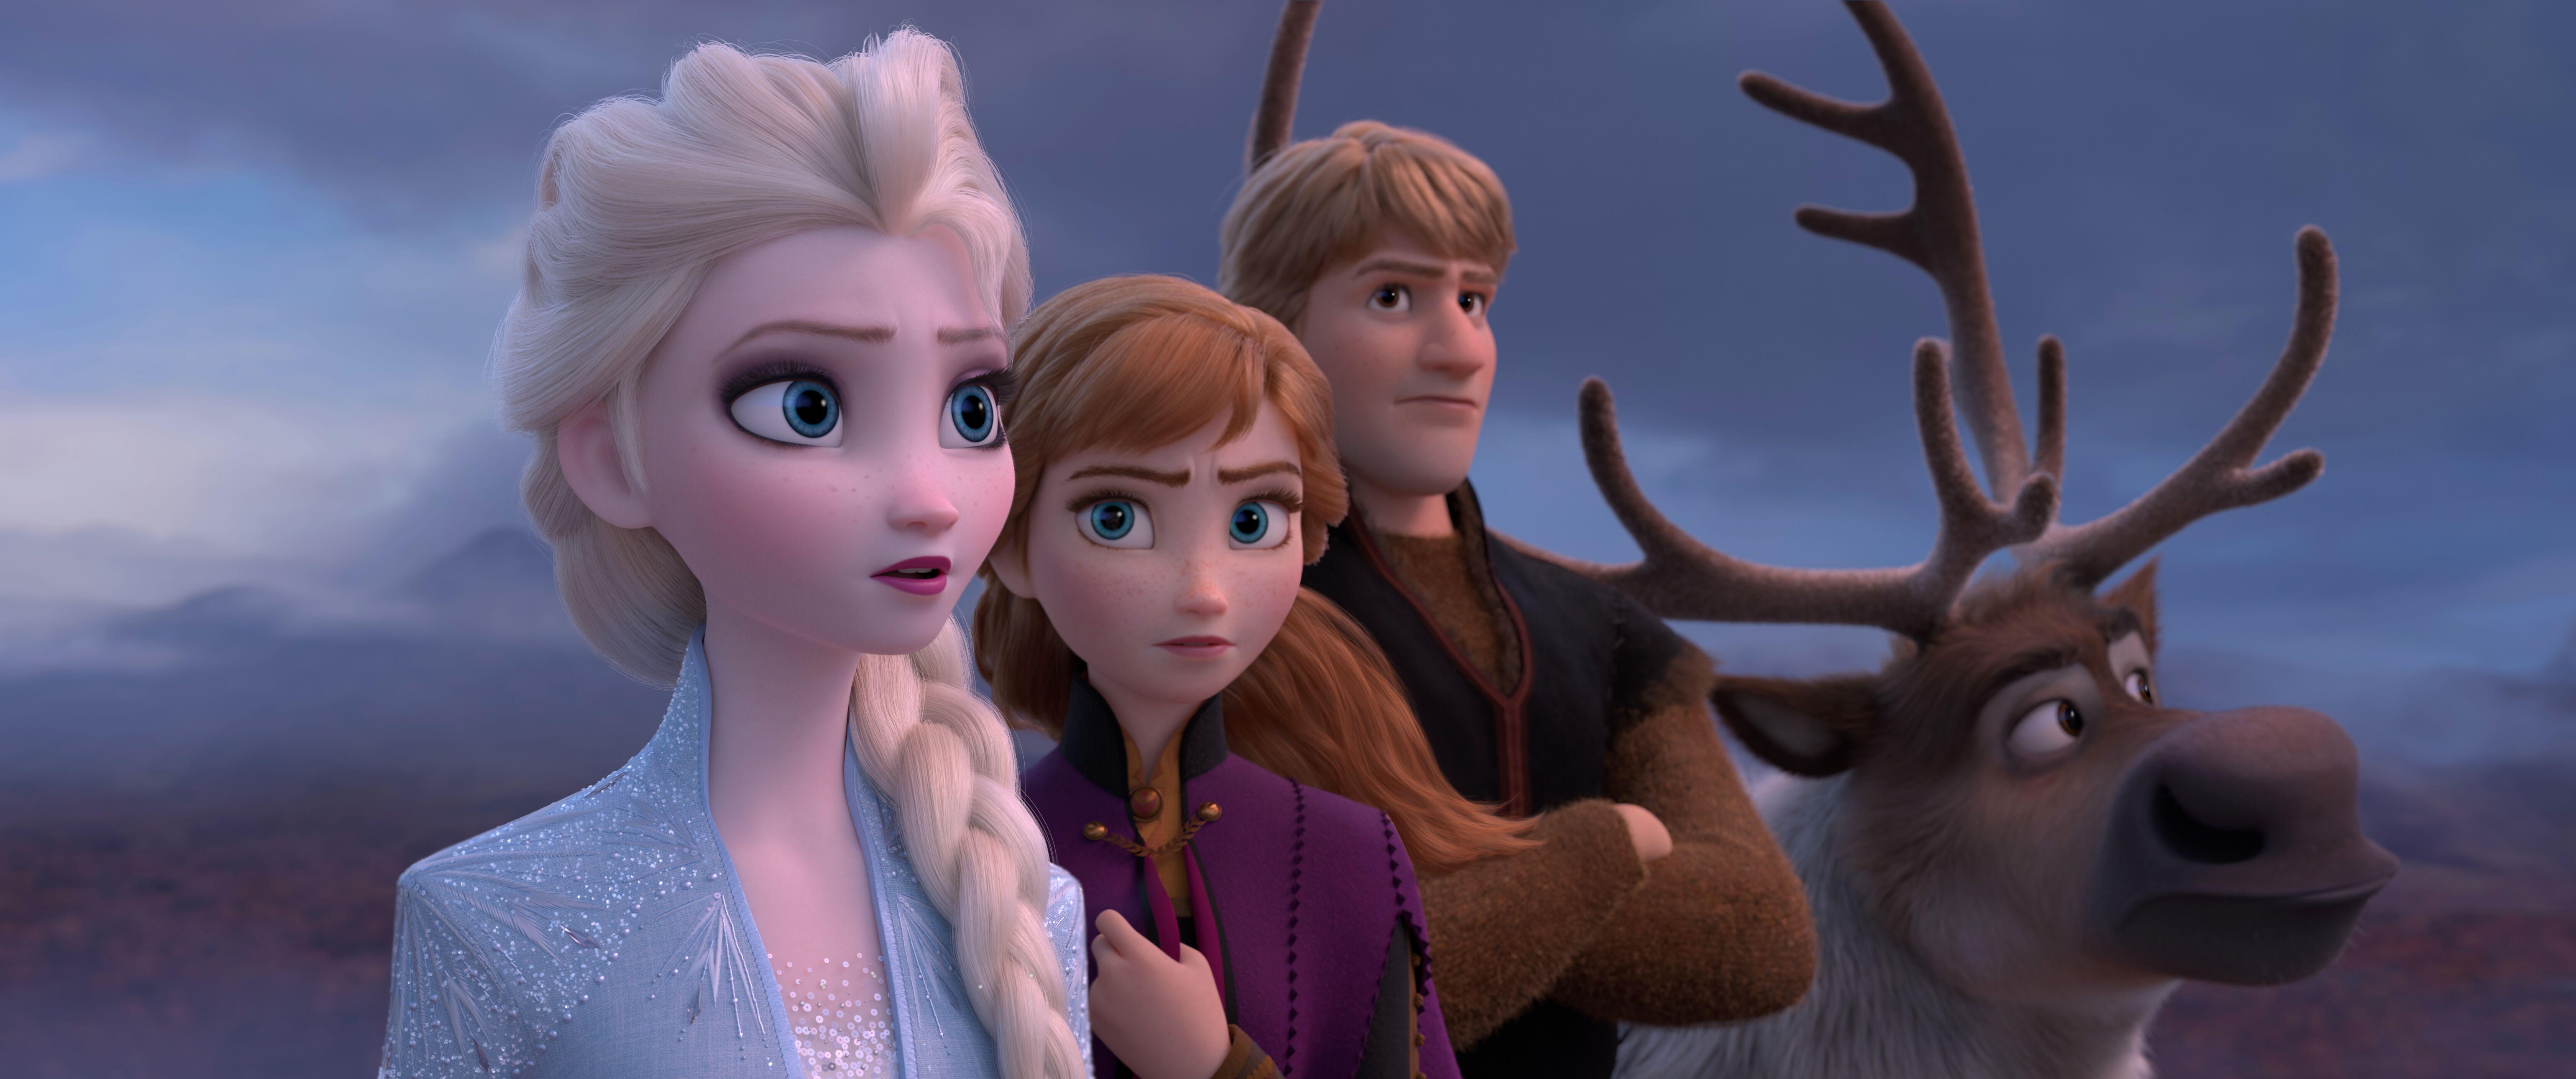 Frozen 2 presto al cinema